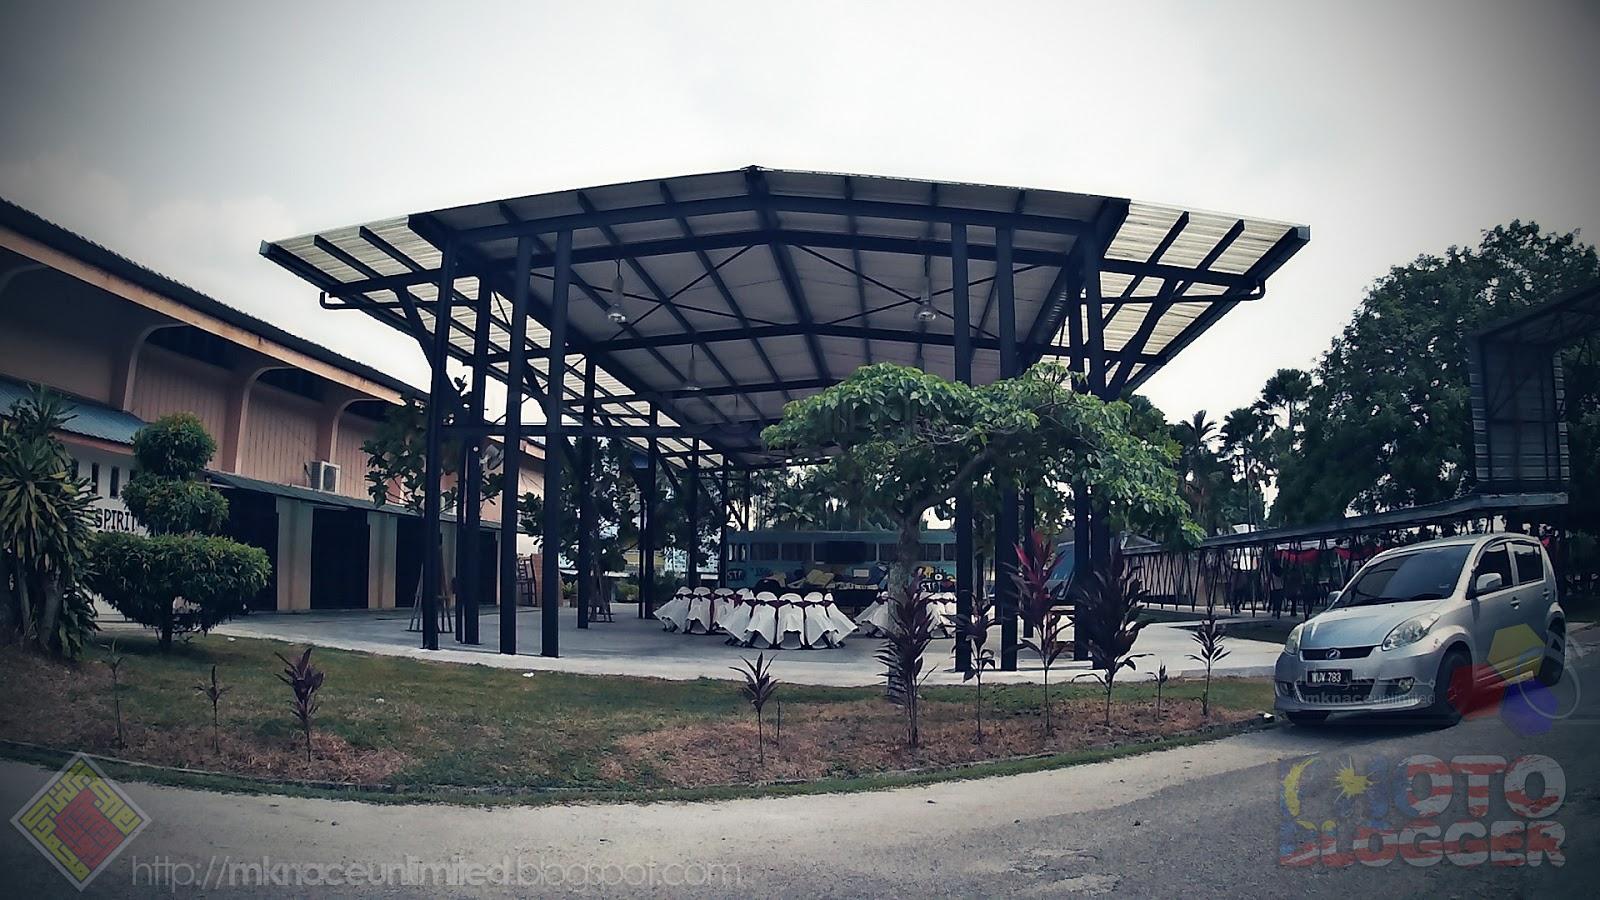 Sekolah Tun Fatimah 20181005 Lawatan Hujung Minggu Mknace Roti Tissue By Canai Ikhwan Gh Corner Mks Dah Sampai